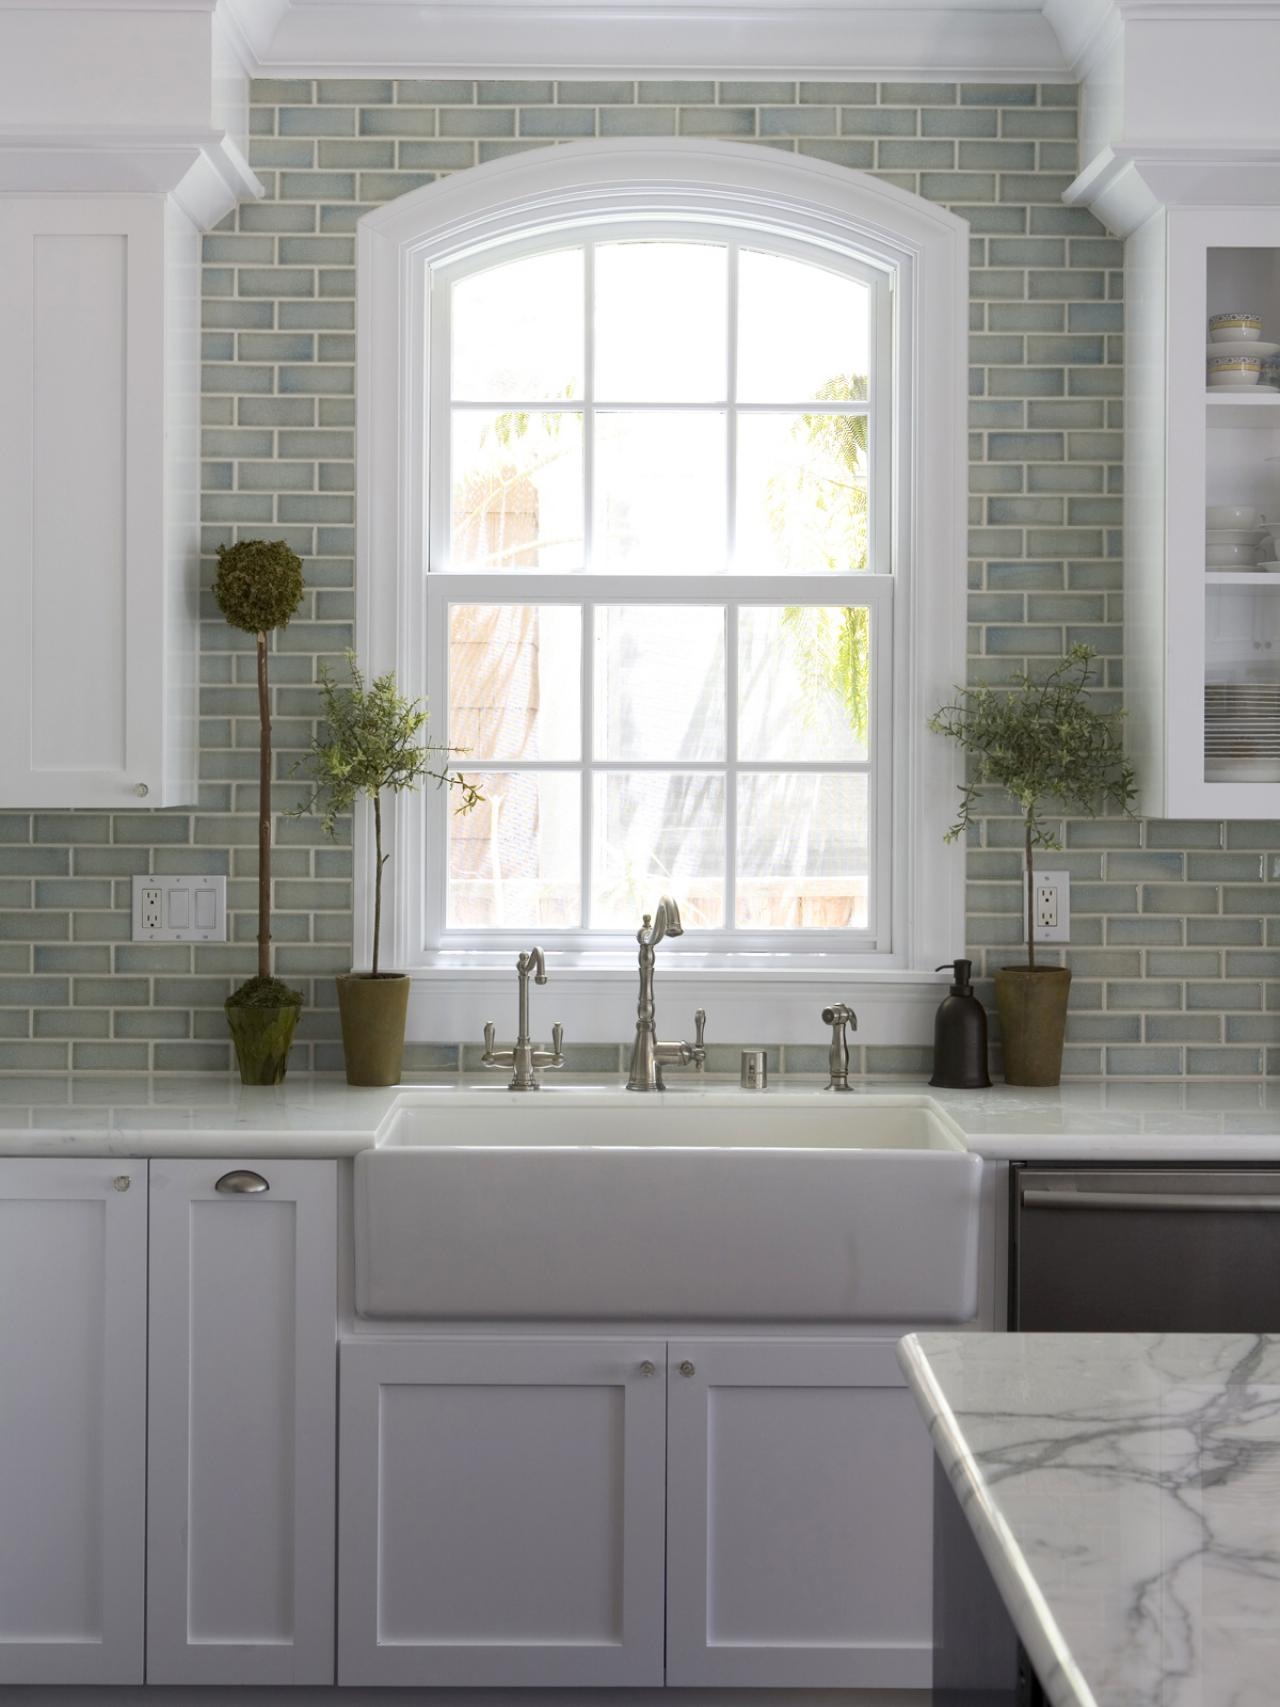 Kitchen Window Treatments Ideas: HGTV Pictures & Tips | HGTV